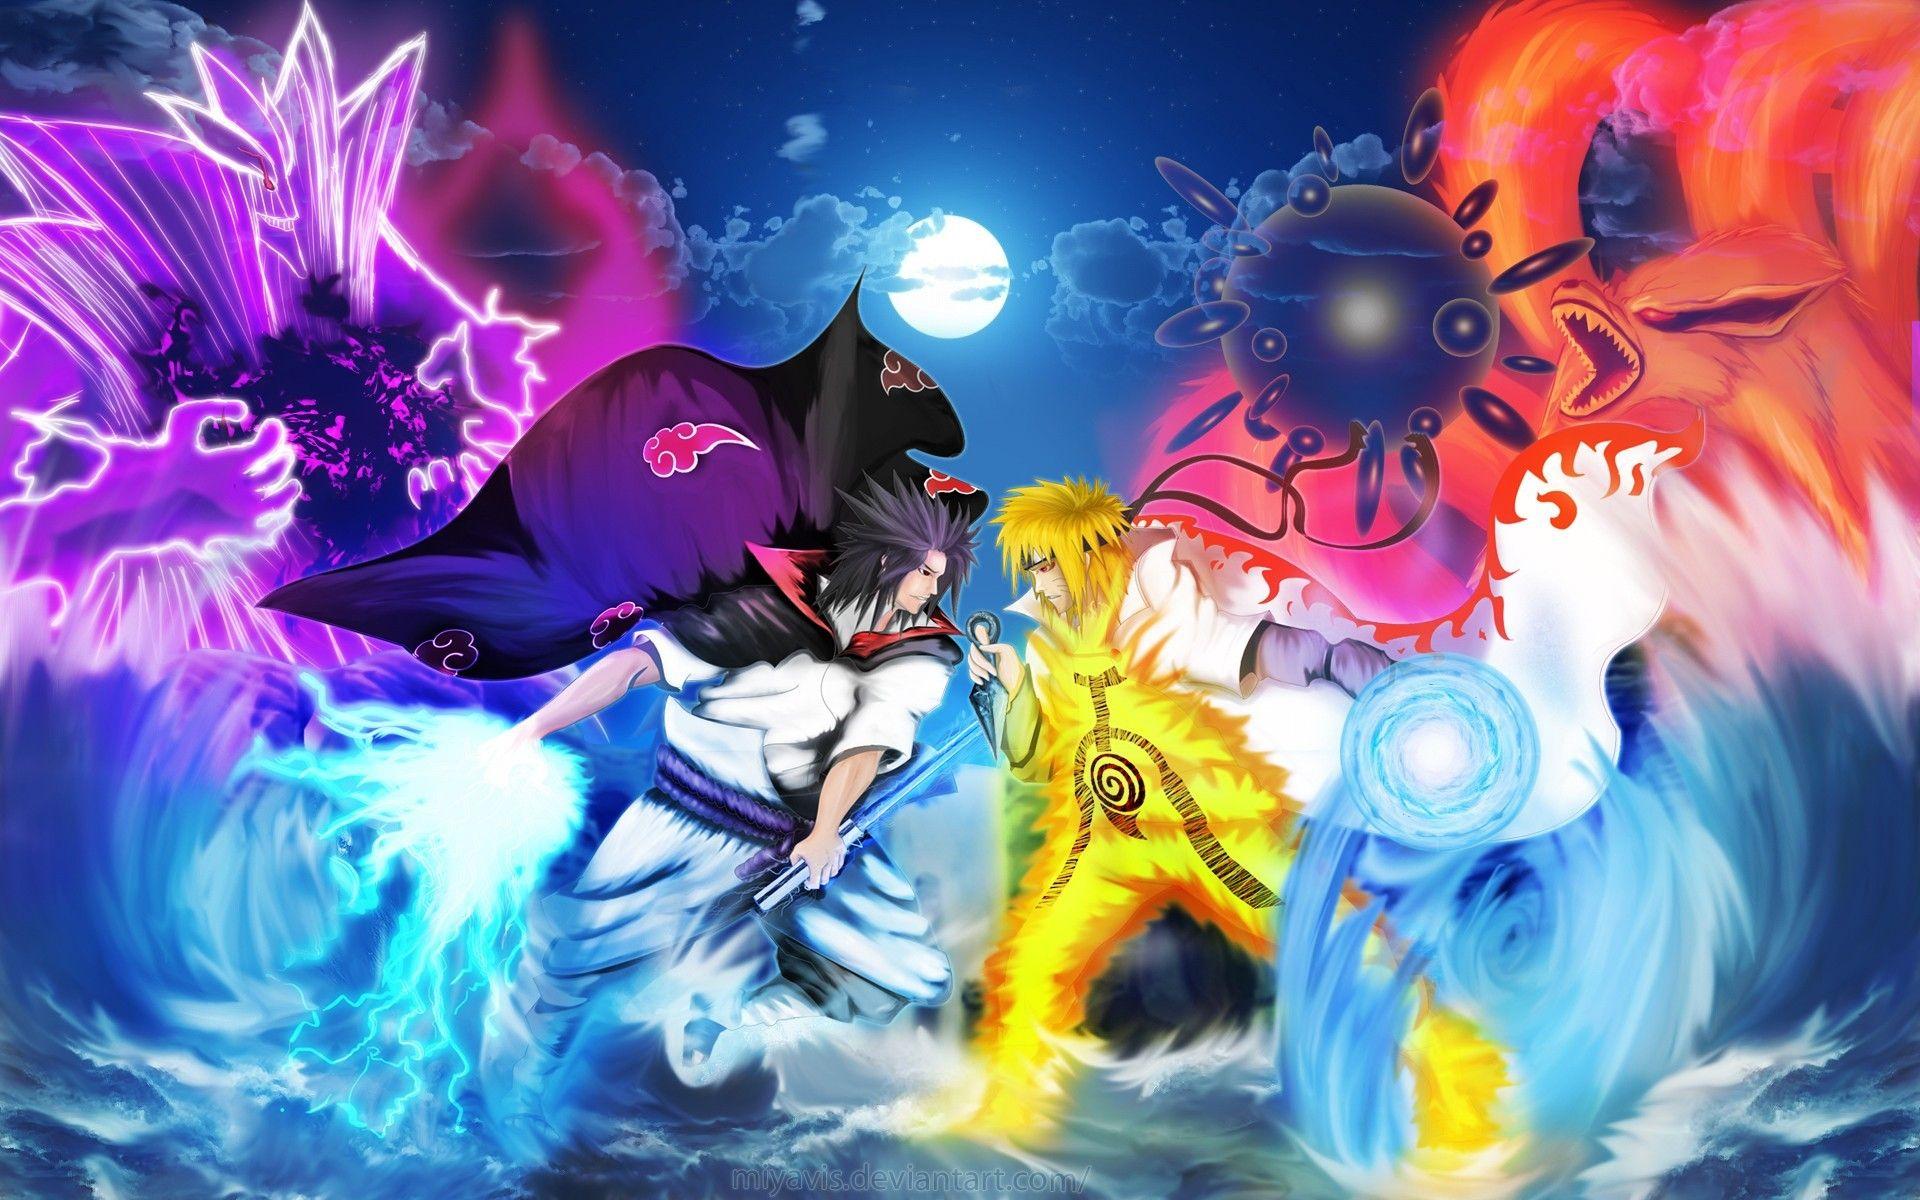 Gambar Animasi Bergerak Naruto Vs Sasuke